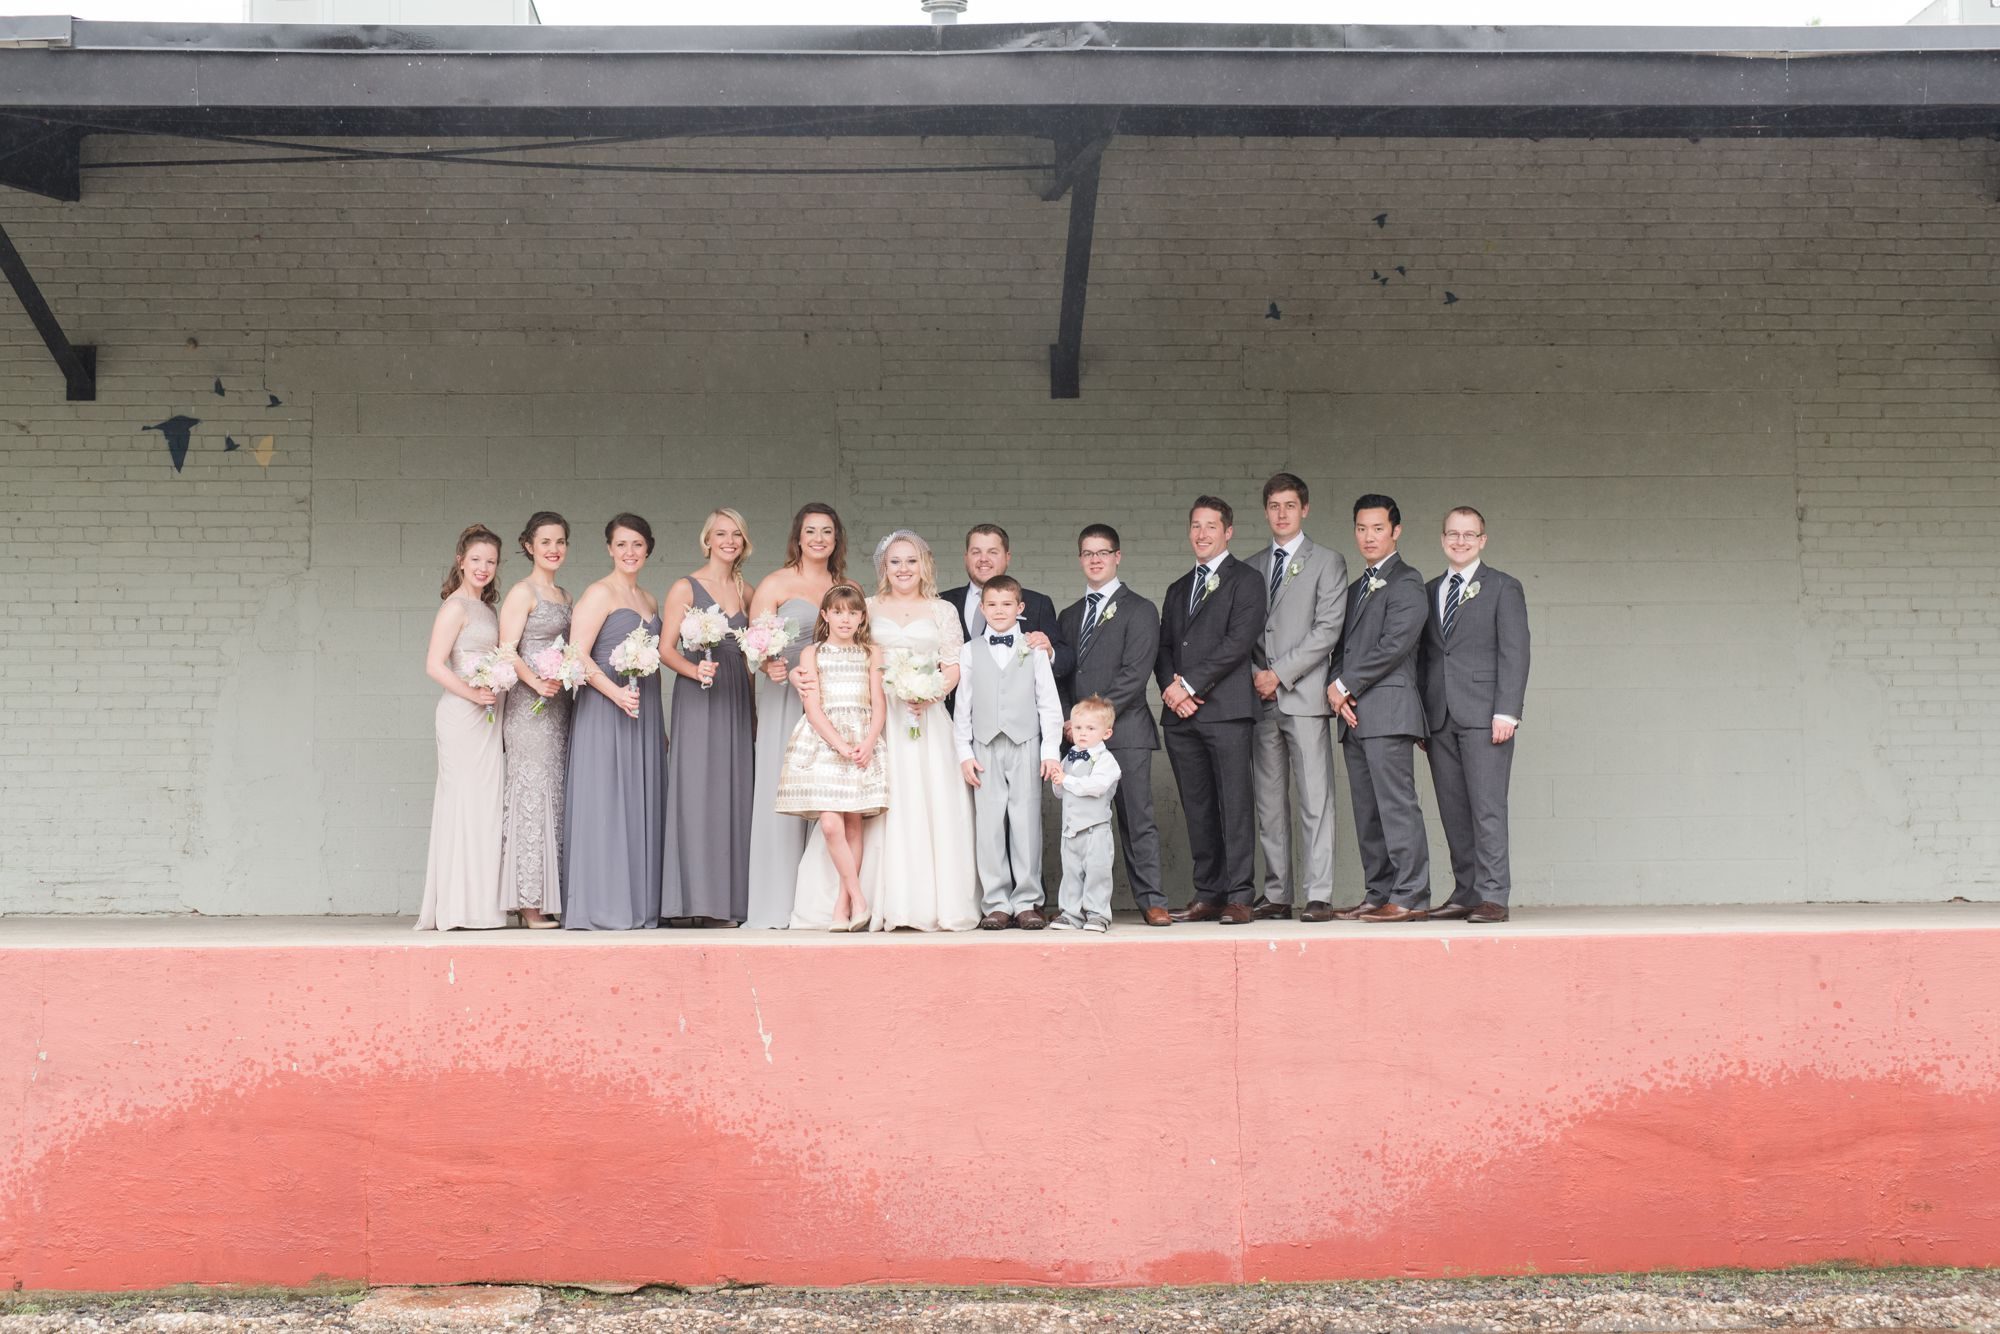 uptown-charlotte-warhouse-wedding 46